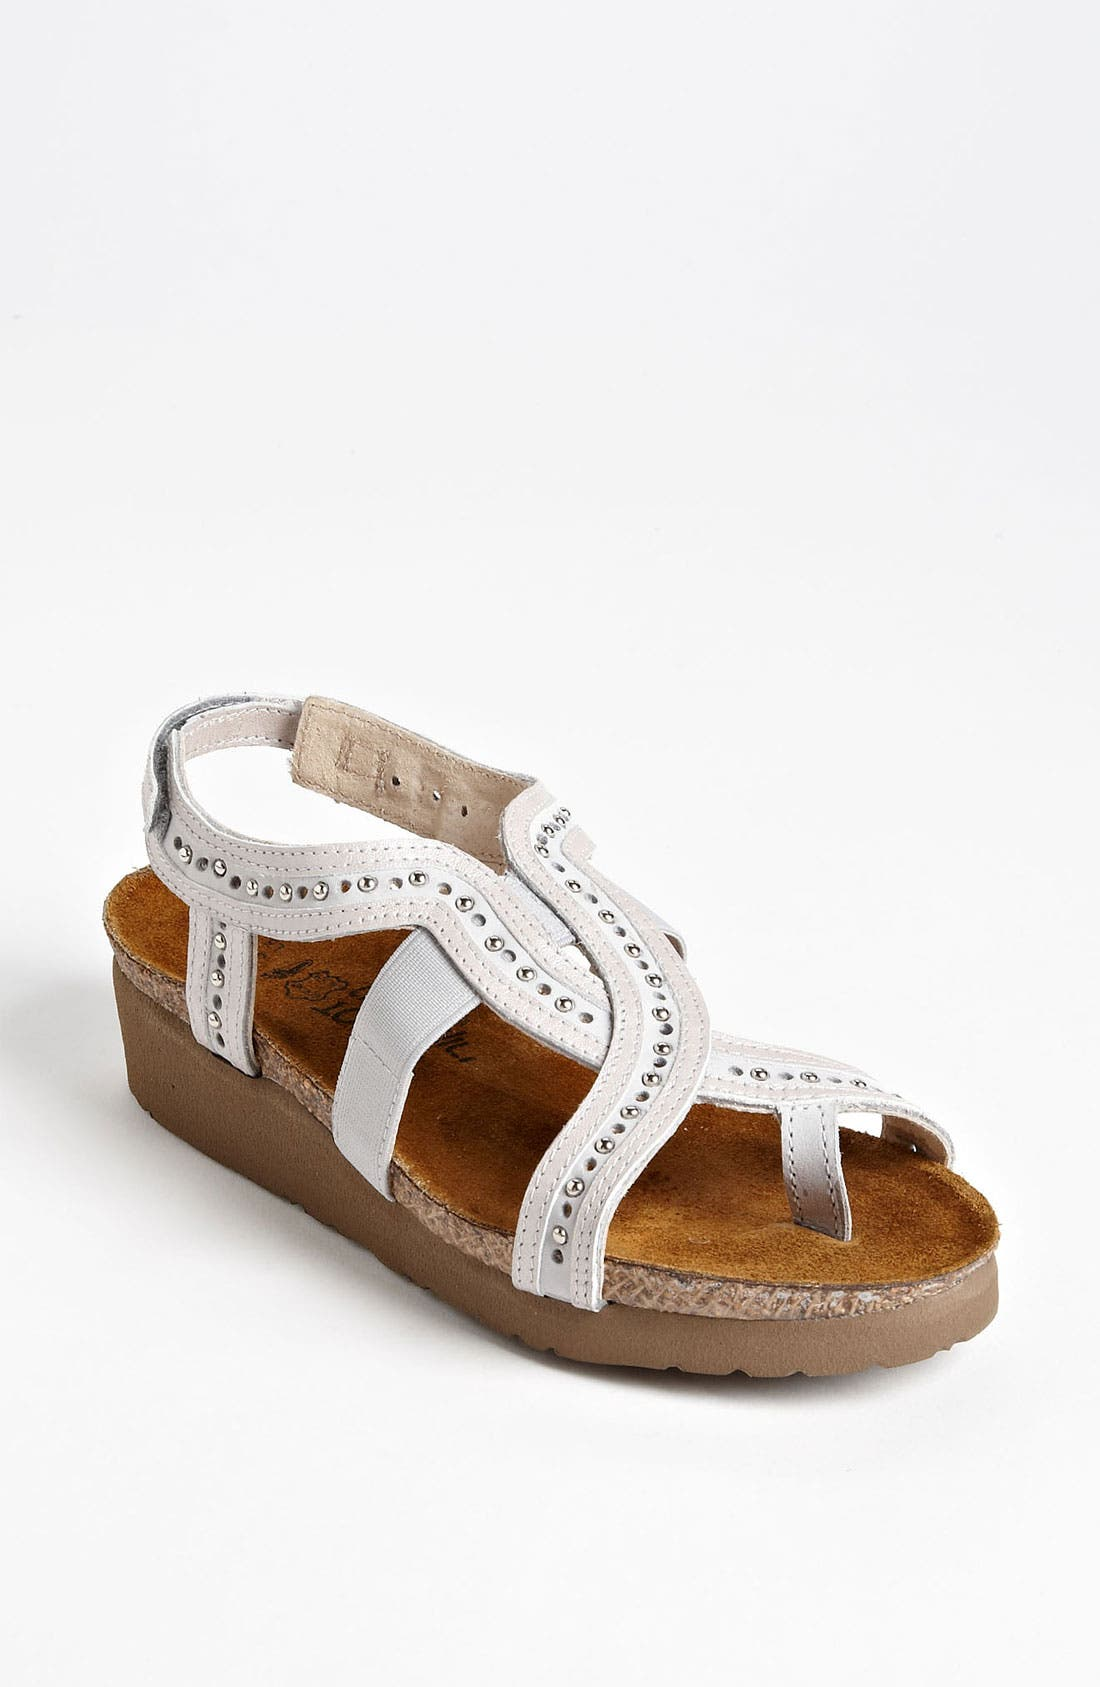 Main Image - Naot 'Hillary' Sandal